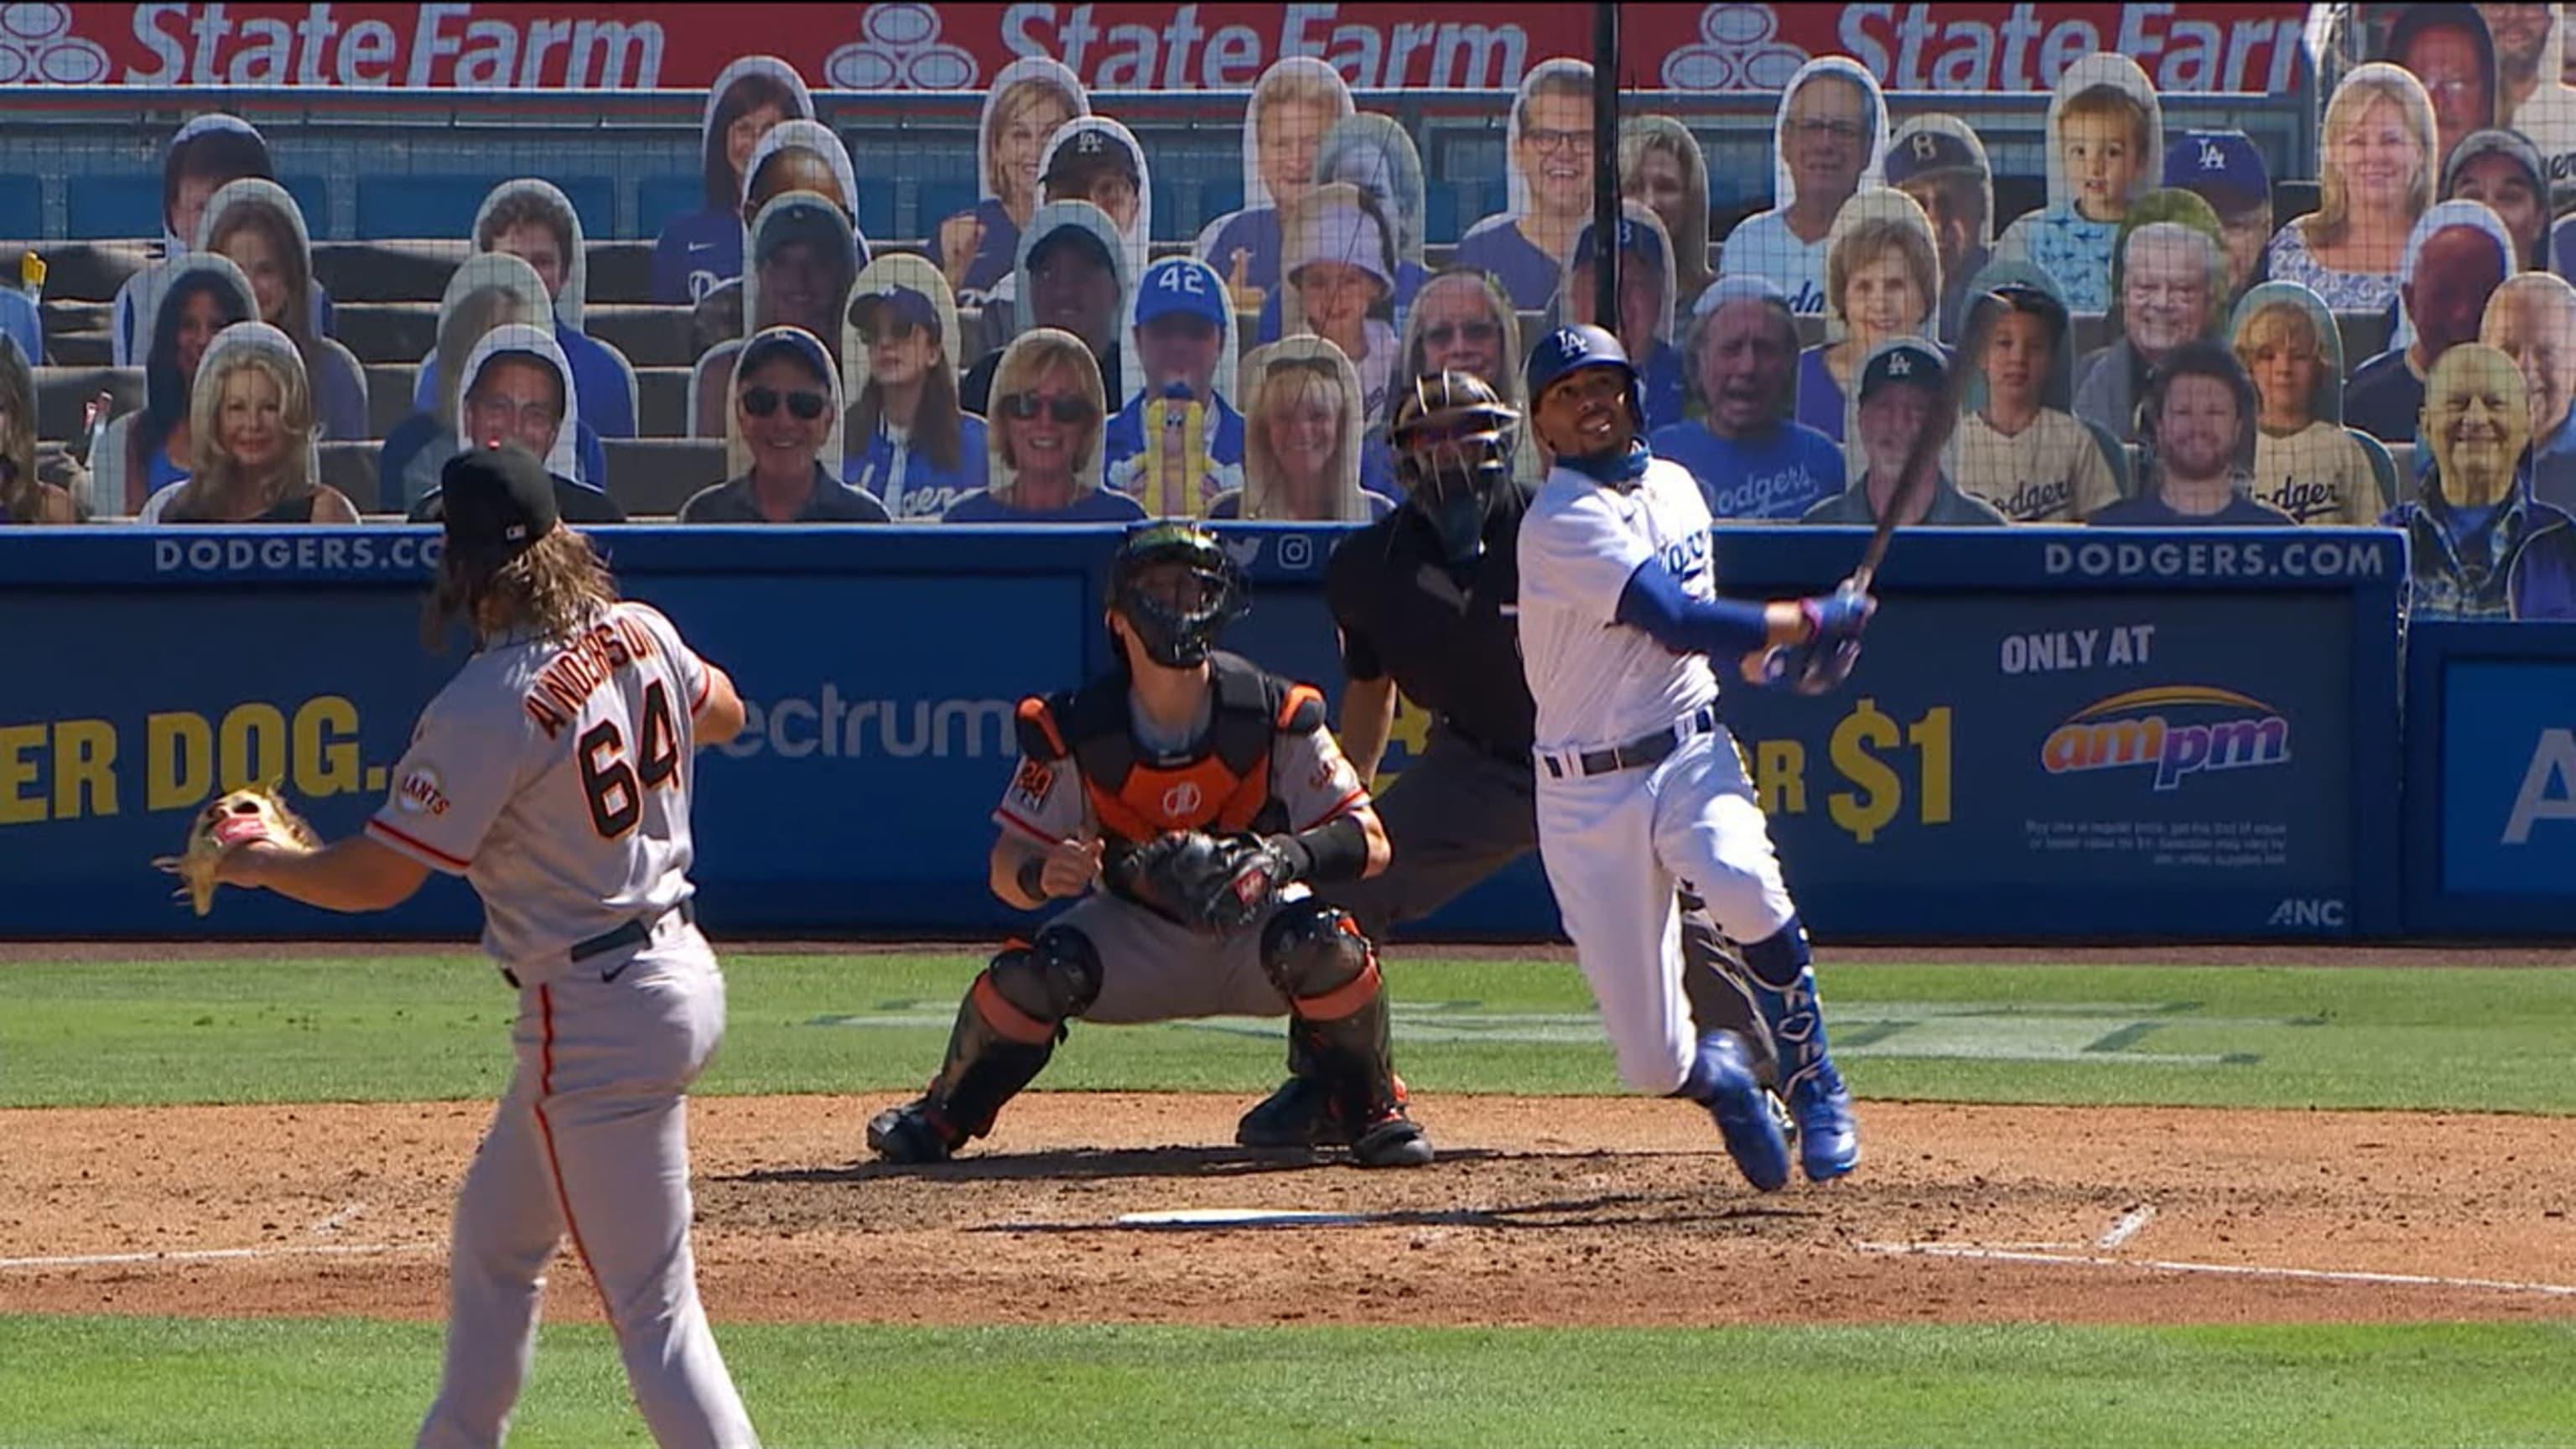 bgt8i0svqvlepdt8fyd8 - AJ Pollock y Mookie Betts se combinan a la ofensiva en triunfo de Dodgers